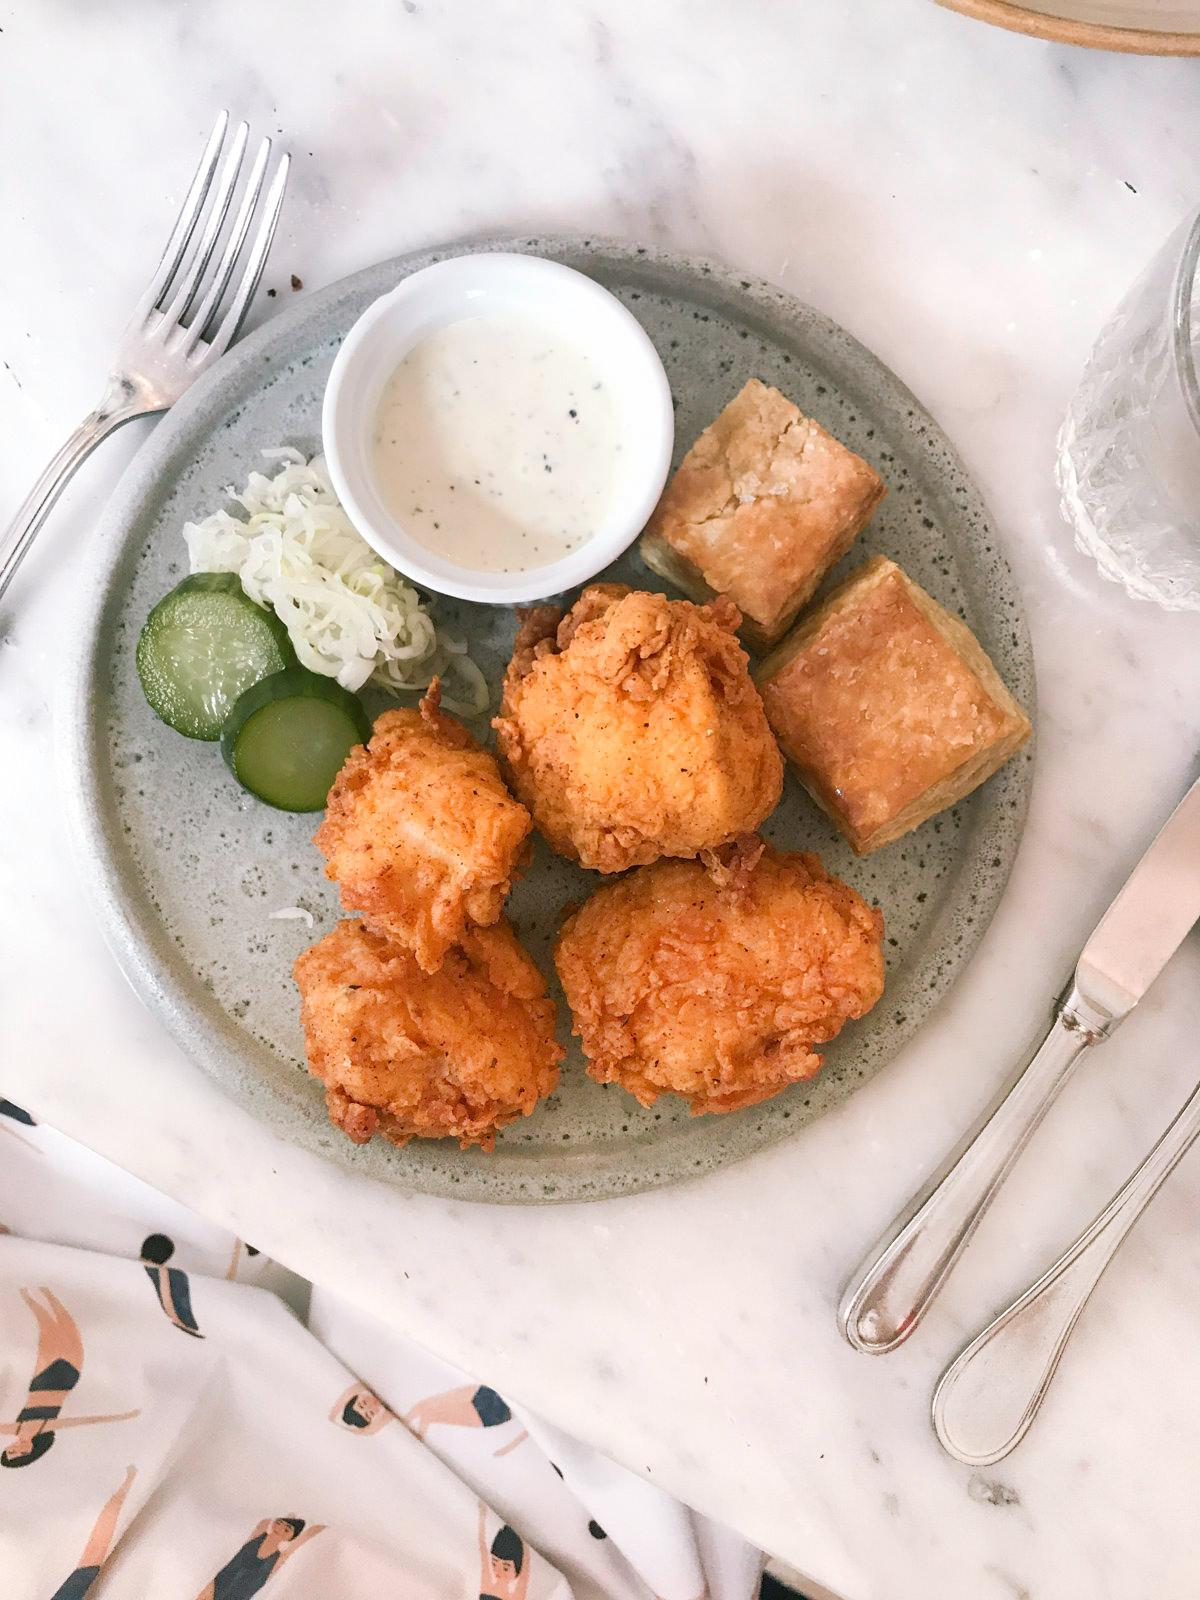 Blog-Mode-And-The-City-Lifestyle-Cinq-Petites-Choses-231-restaurant-ellsworth-paris2